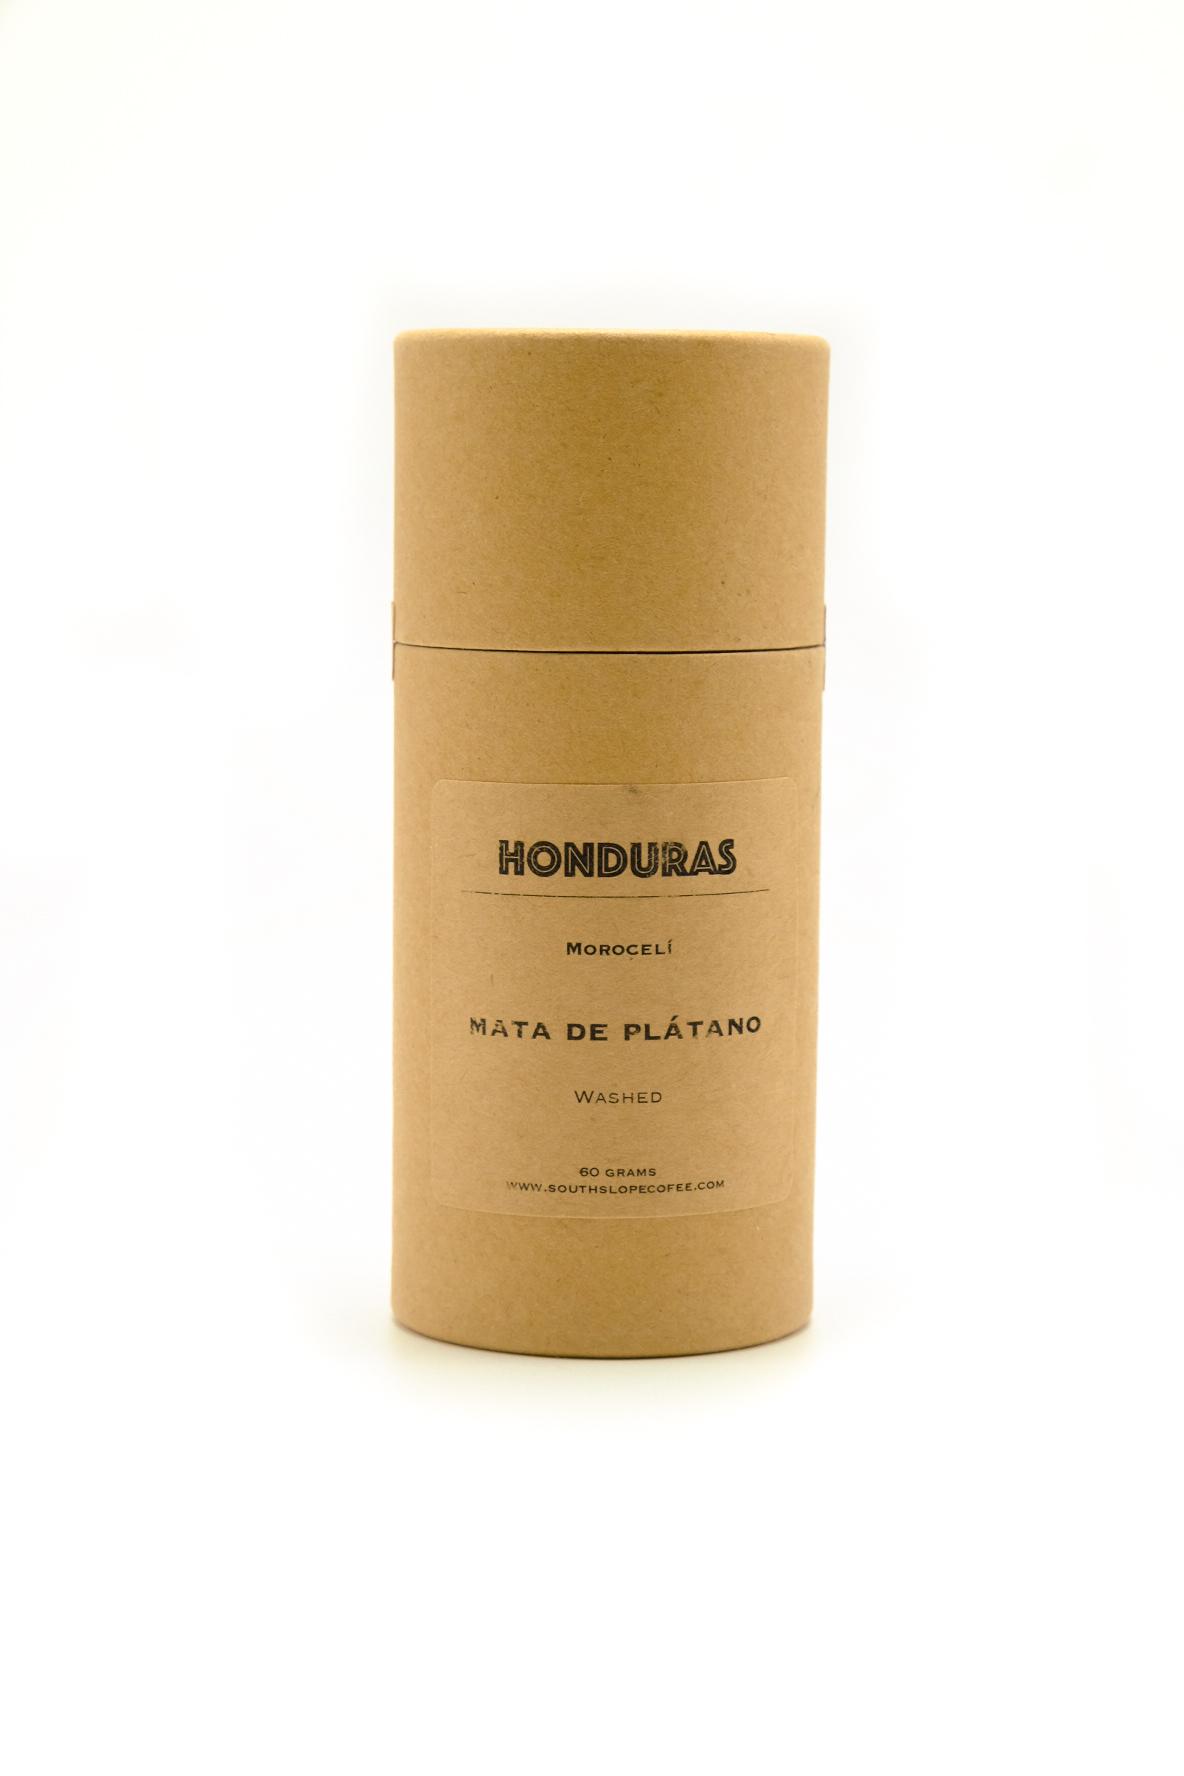 honduras sample